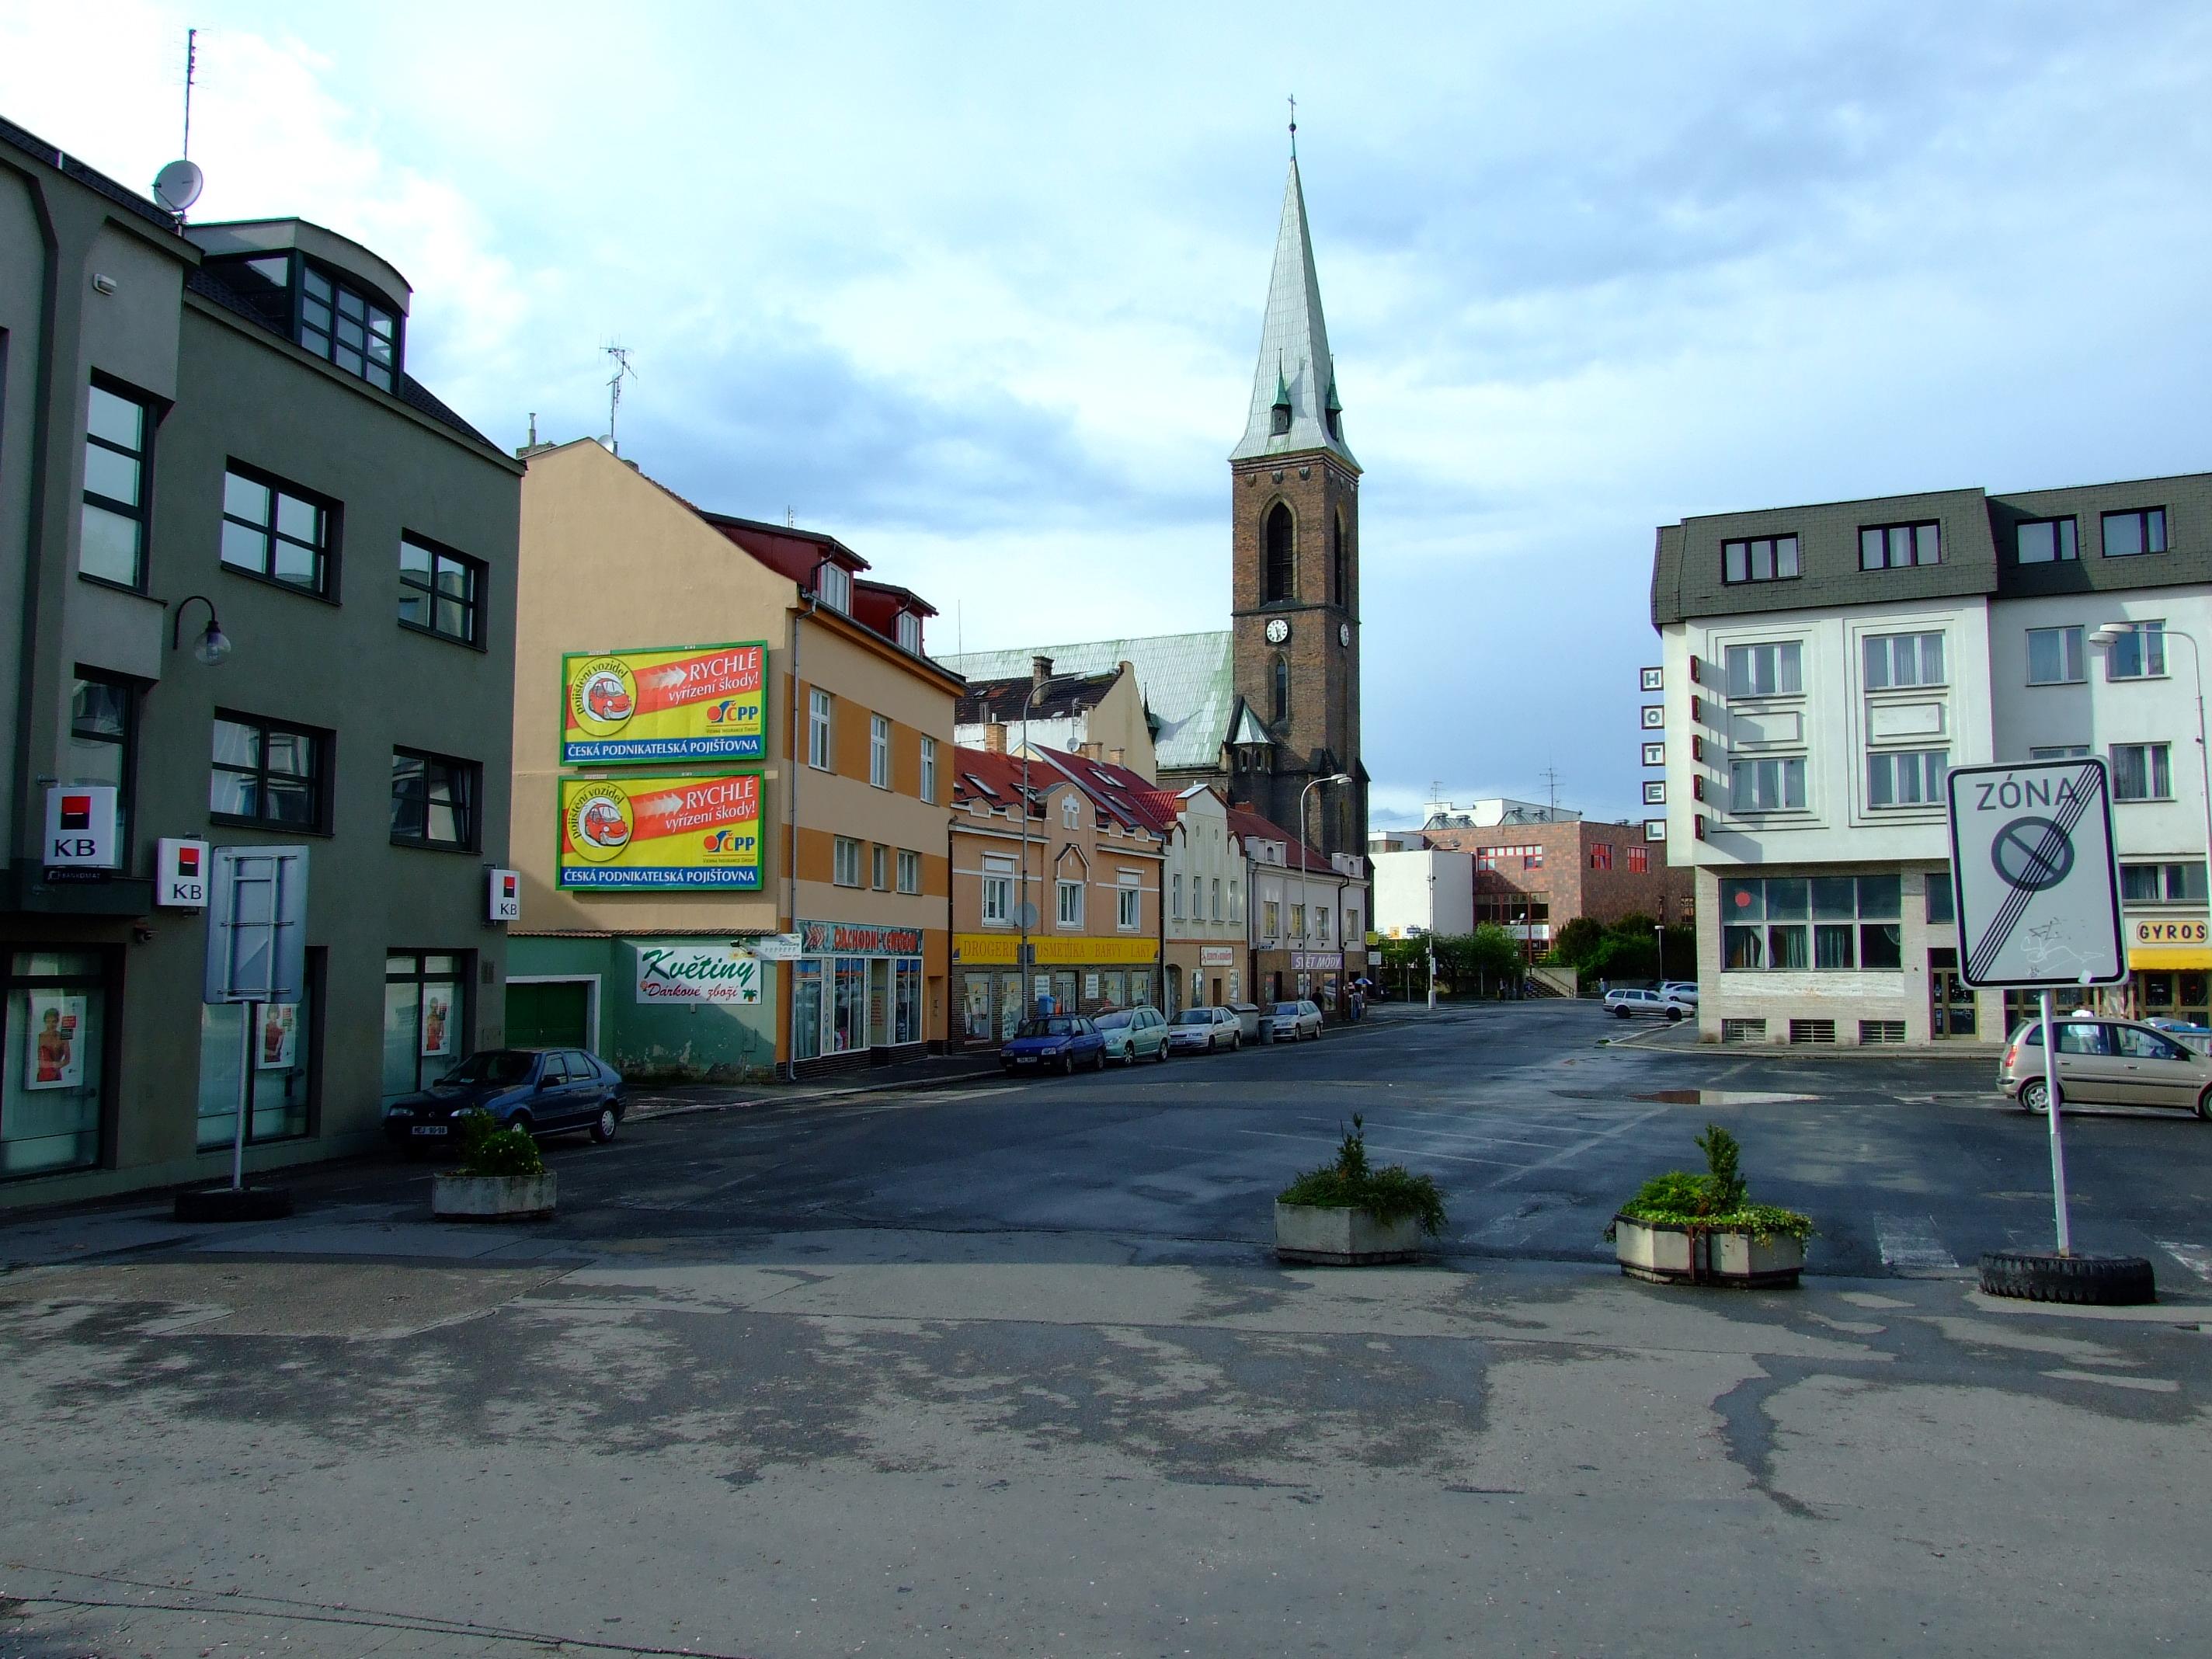 kralupy nad vltavou men Kralupy nad vltavou sú mesto v česku v okrese mělník v stredočeskom kraji 1 januára 2012 tu žilo 18 098 obyvateľov, z toho 9 020 mužov a 9 078 žien.